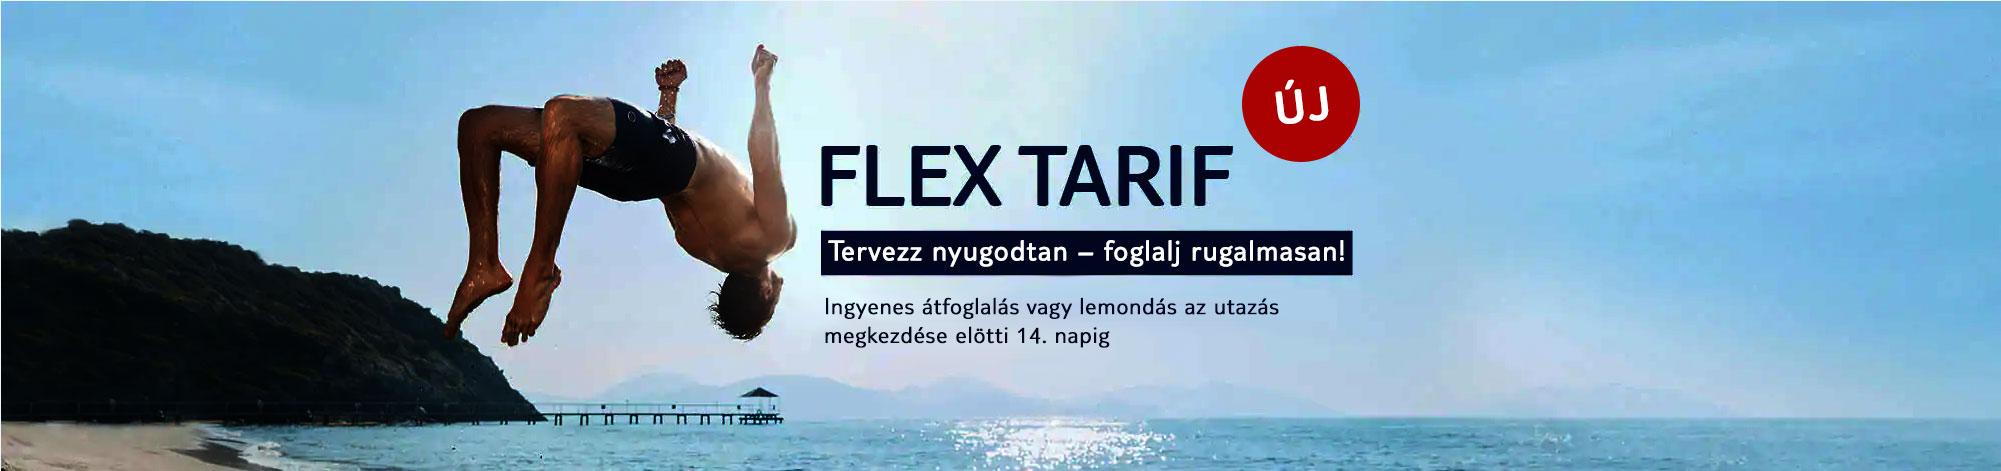 Flex tarif